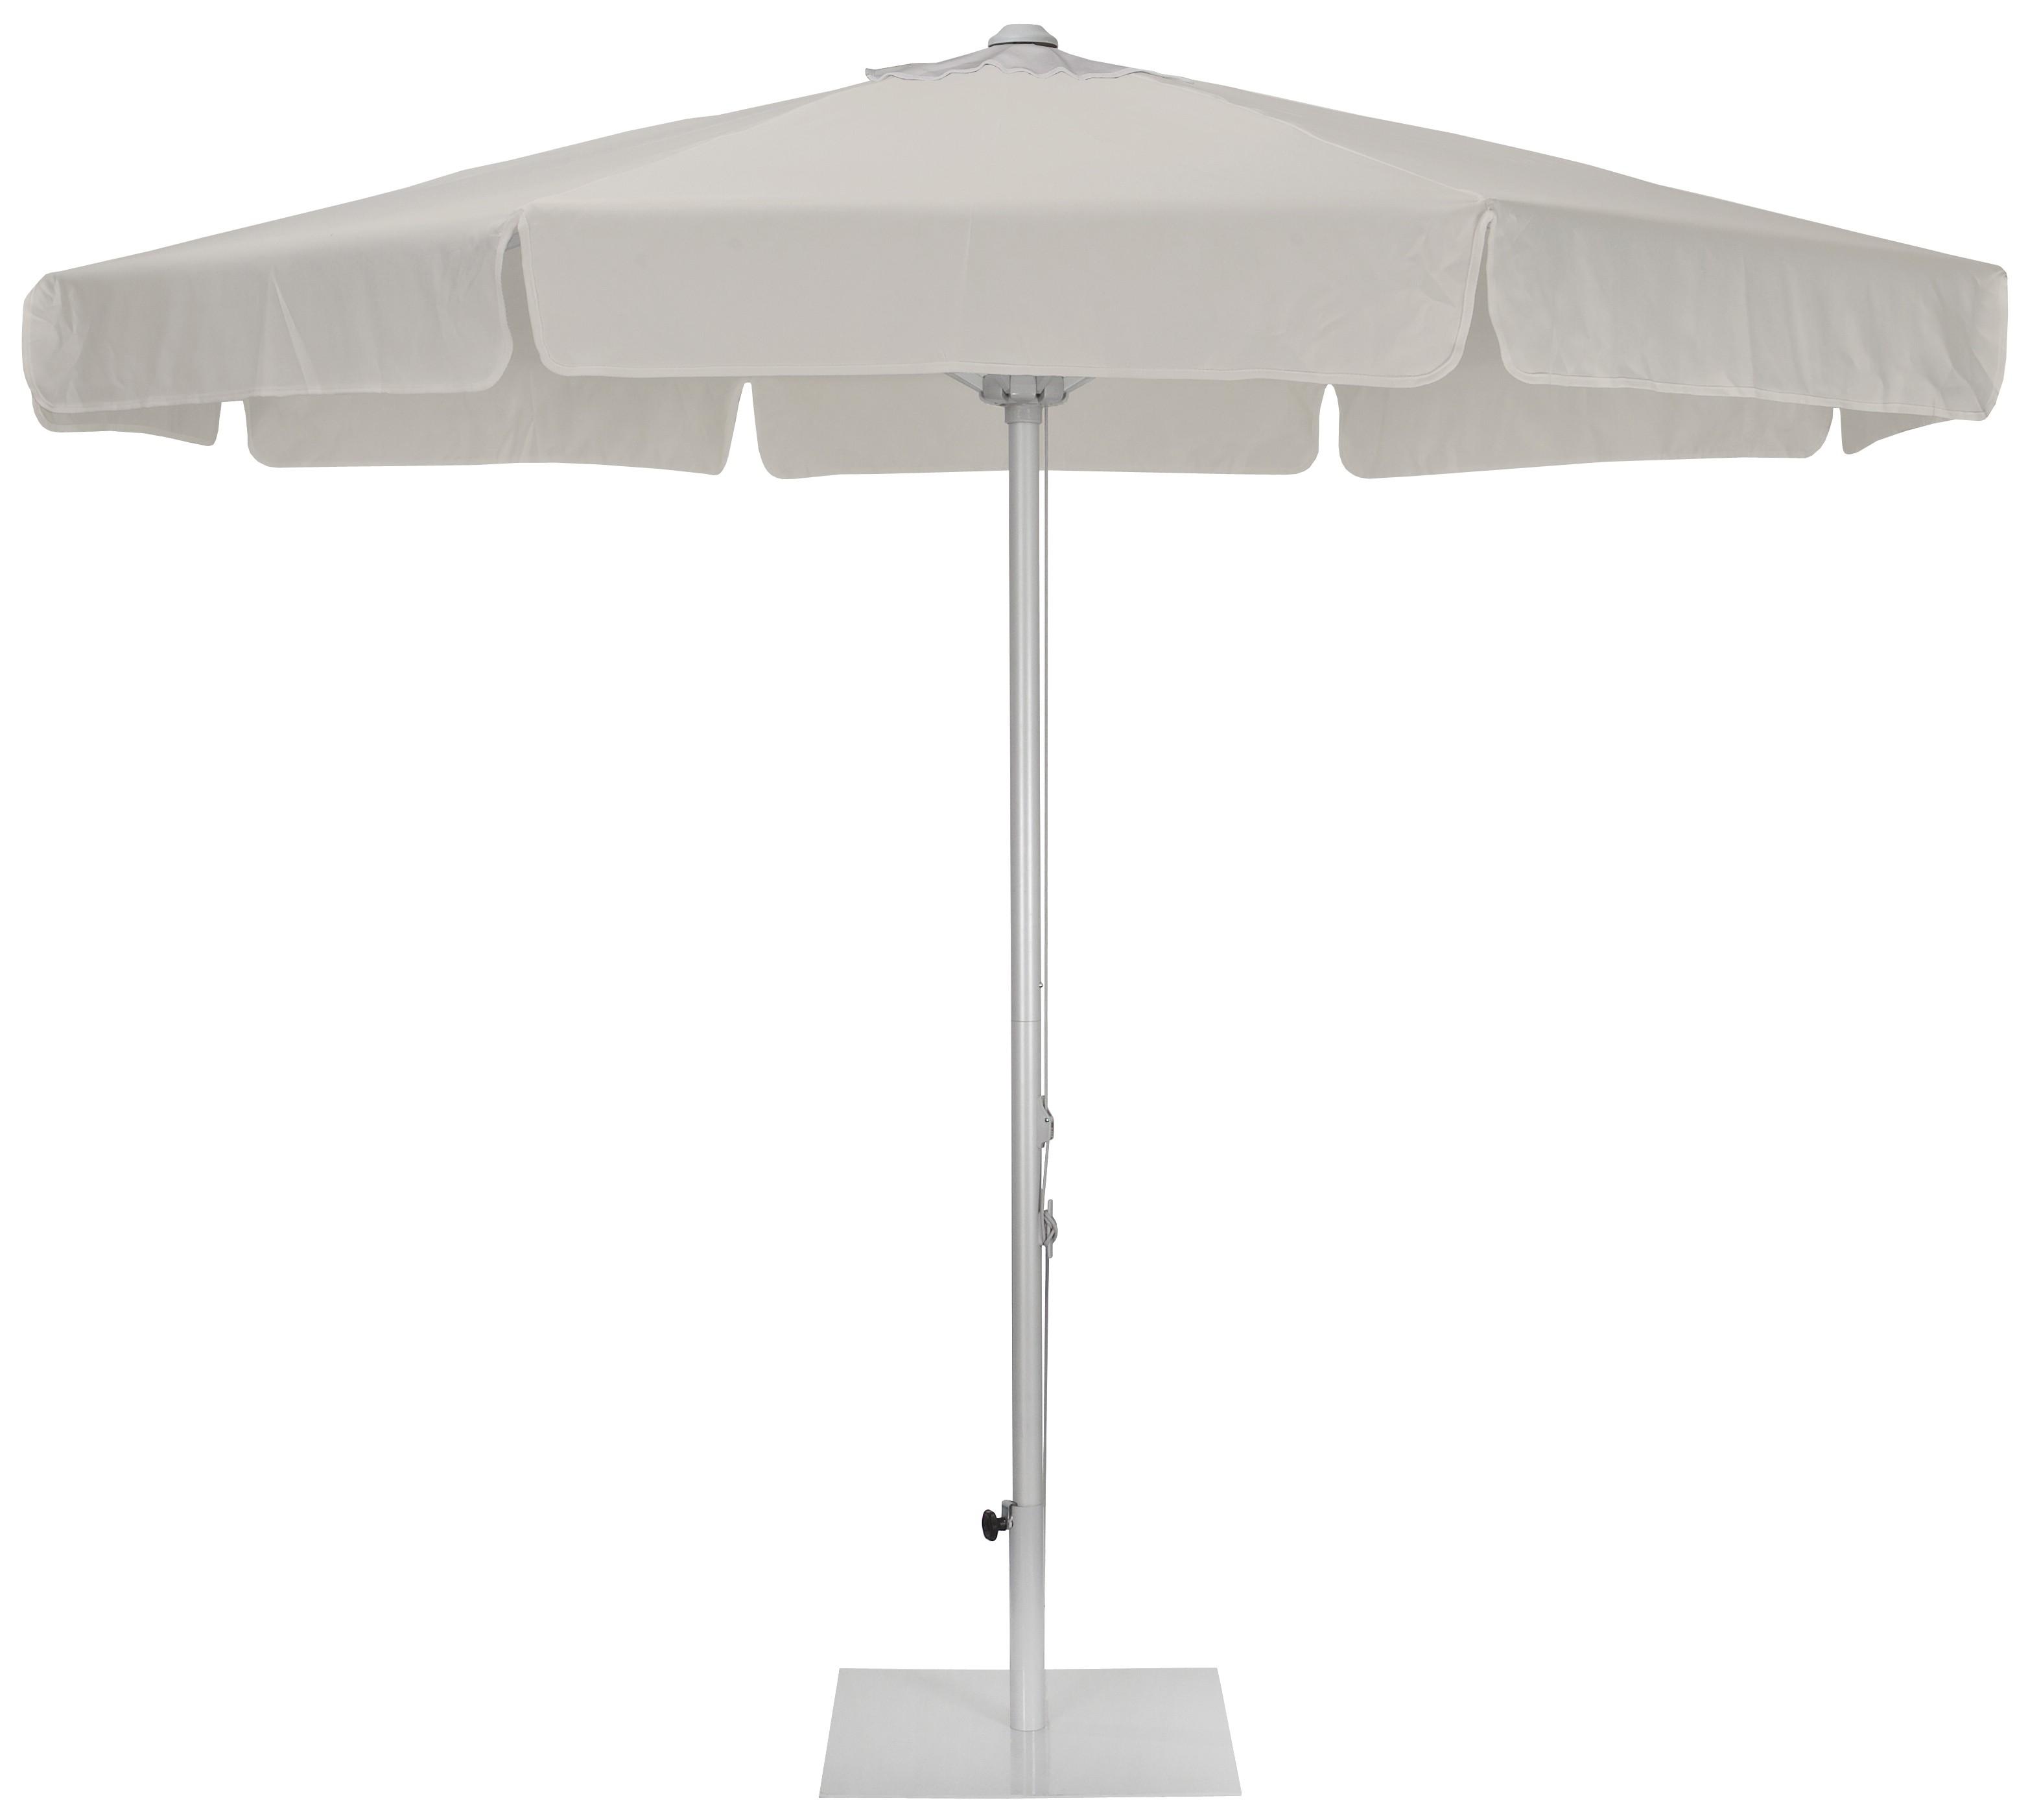 Parasol Ezpeleta Redondos Grey 4 Grises sand Olefin 3